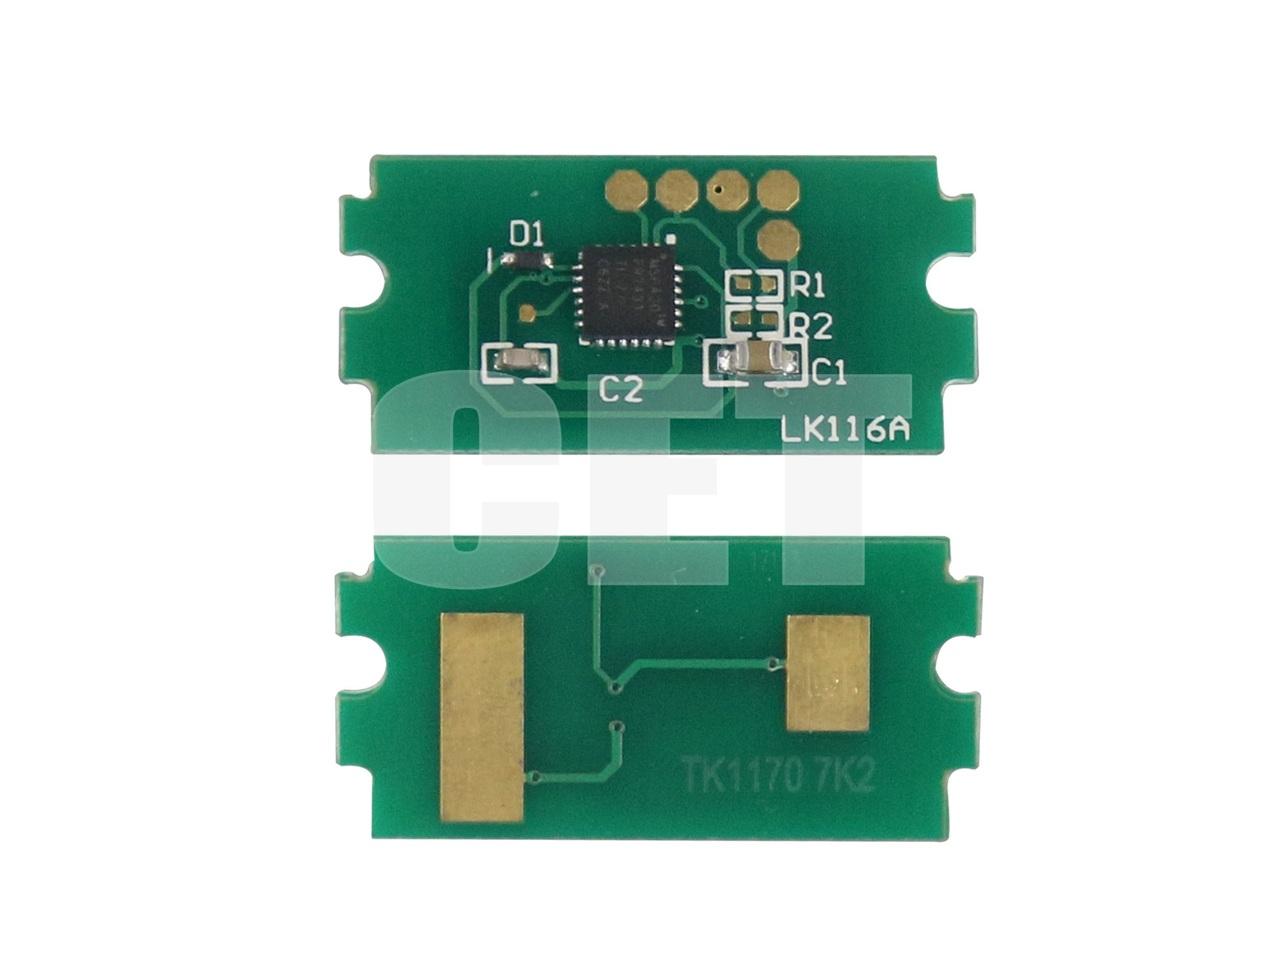 Чип картриджа TK-1170 для KYOCERA ECOSYSM2040dn/2540dn/2540dw (CET), CET9644